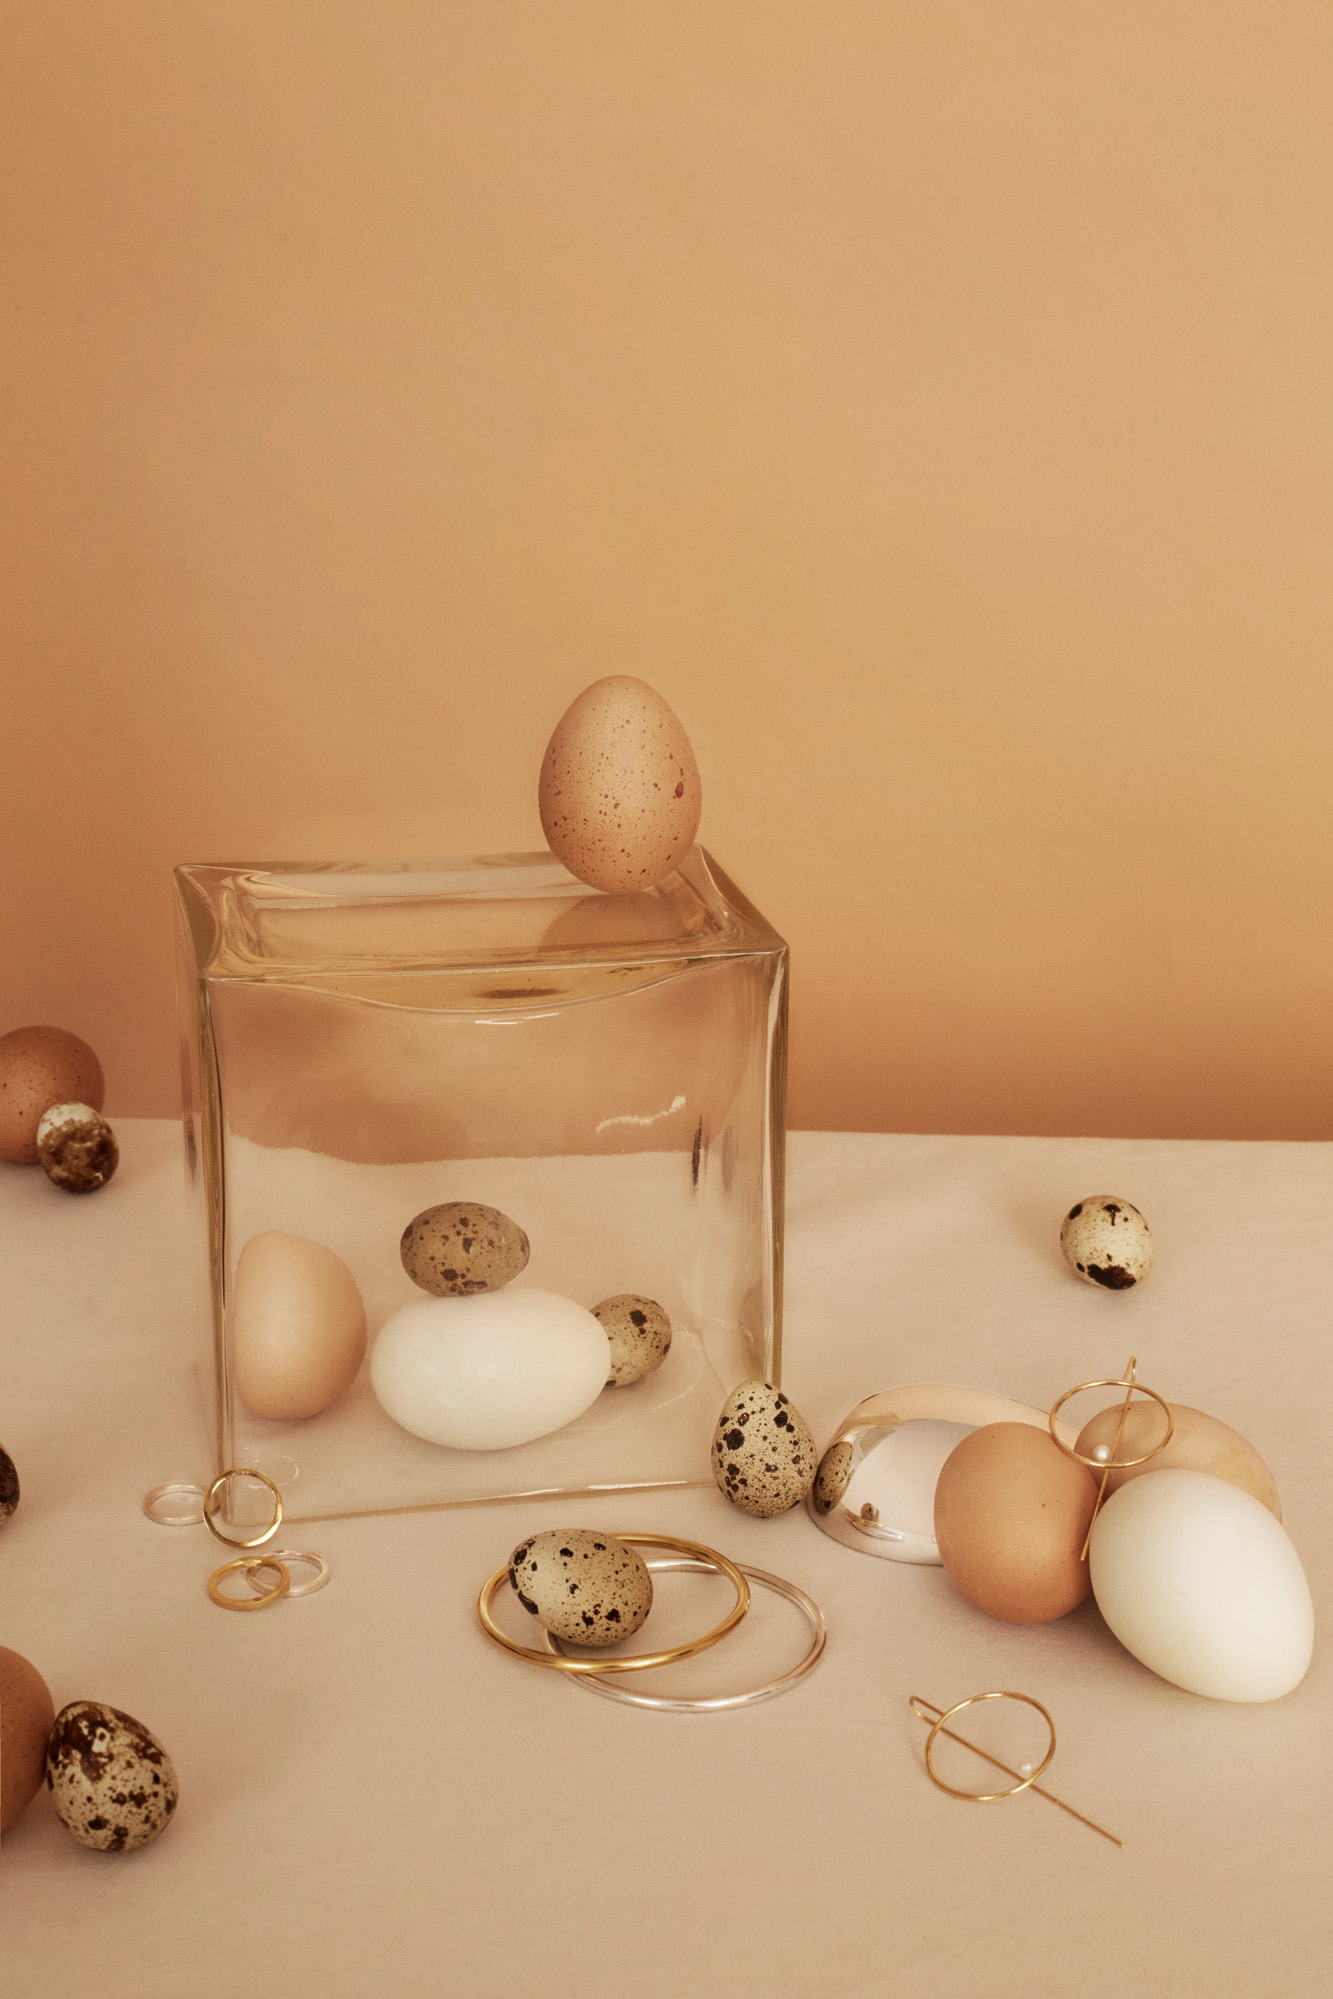 Bracelets in silver and gold Kiki Dieterle Rings in silver and gold and one with a twist Kiki Dieterle  Gold loop pearl earrings TAKK